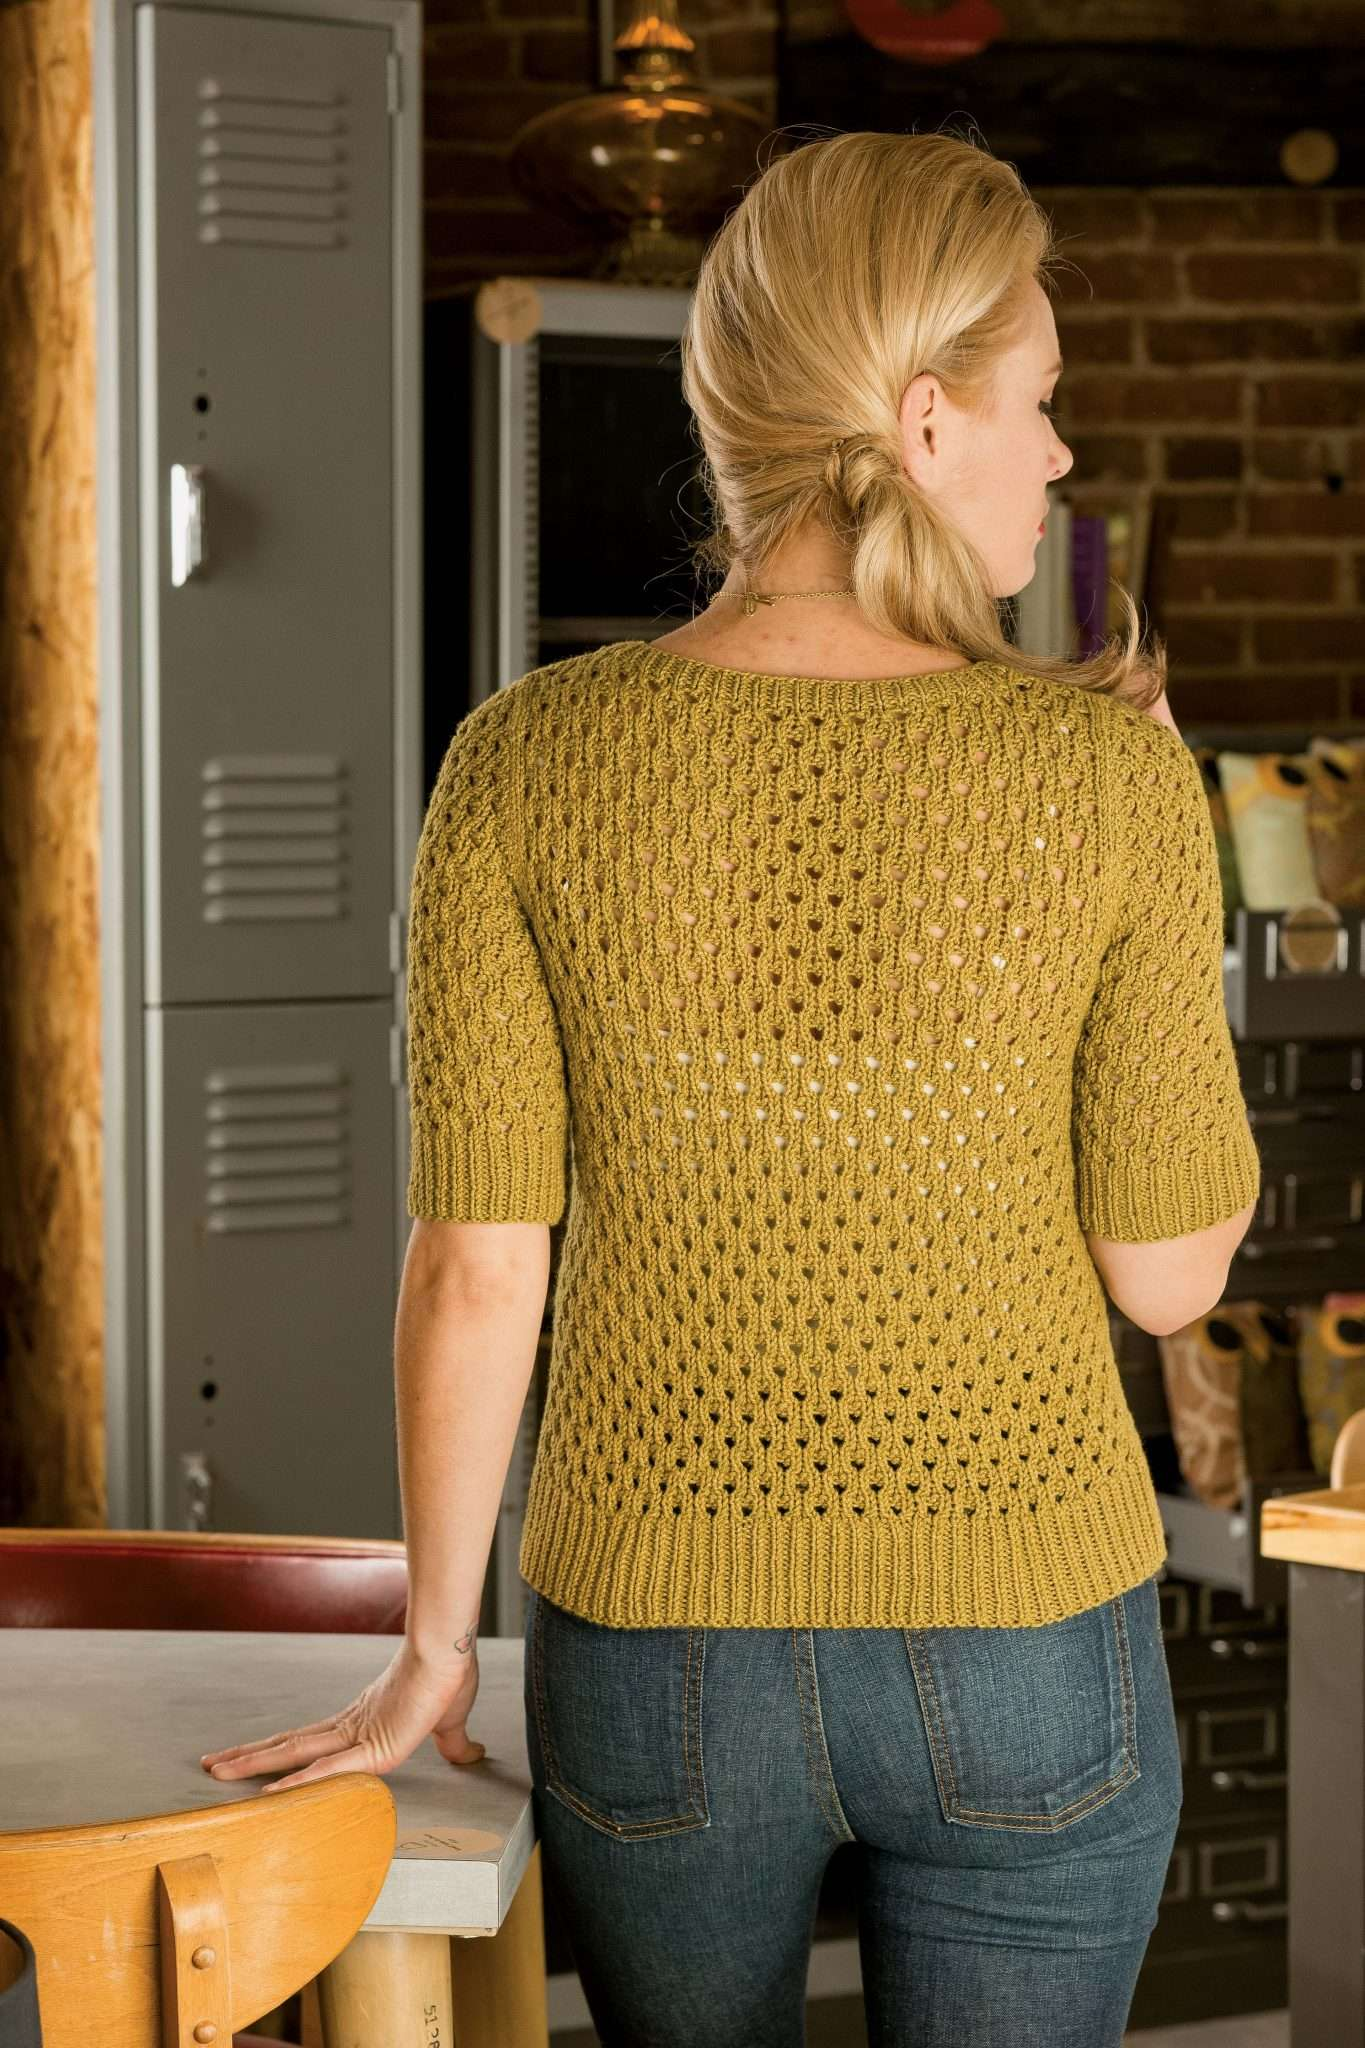 Corcoran Pullover - Interweave Knits Spring 2015 Spring Knitting Patterns